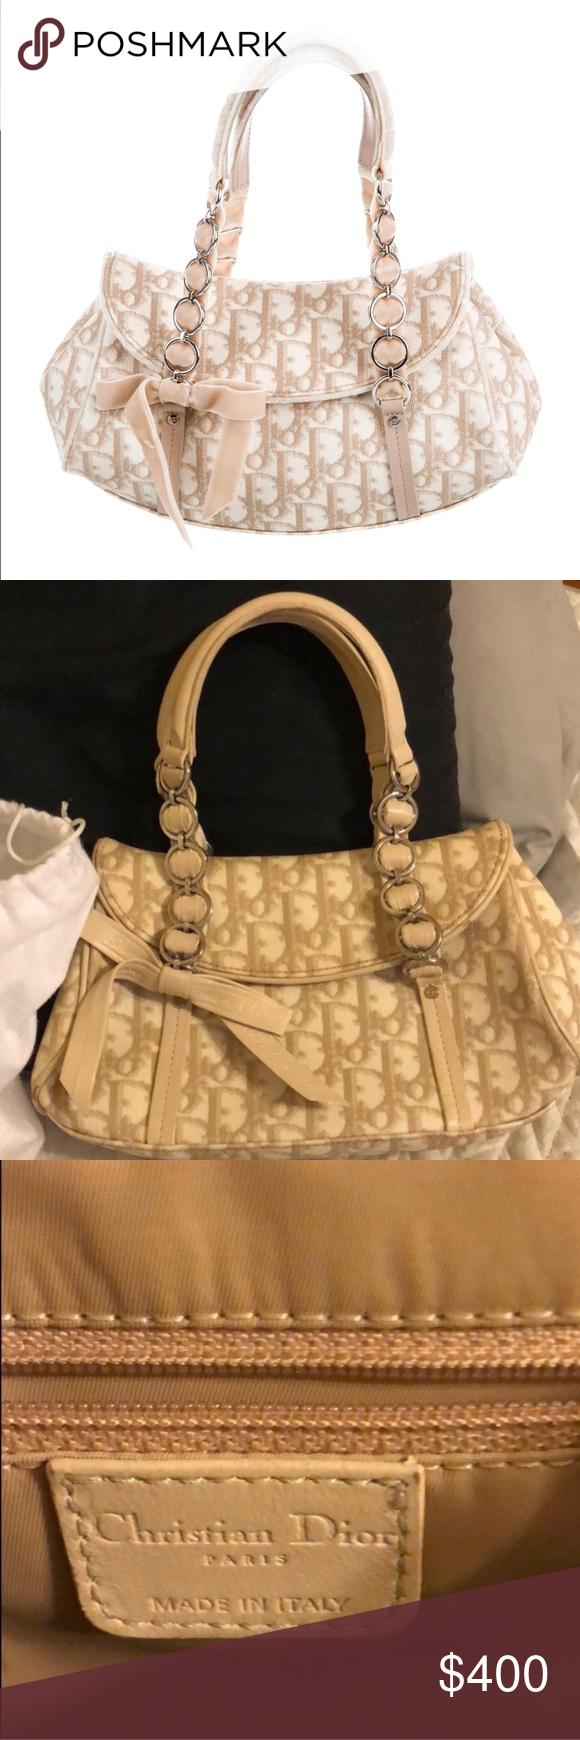 Christian Dior Trotter Romantique bag Beautiful 0e5859e57b80a